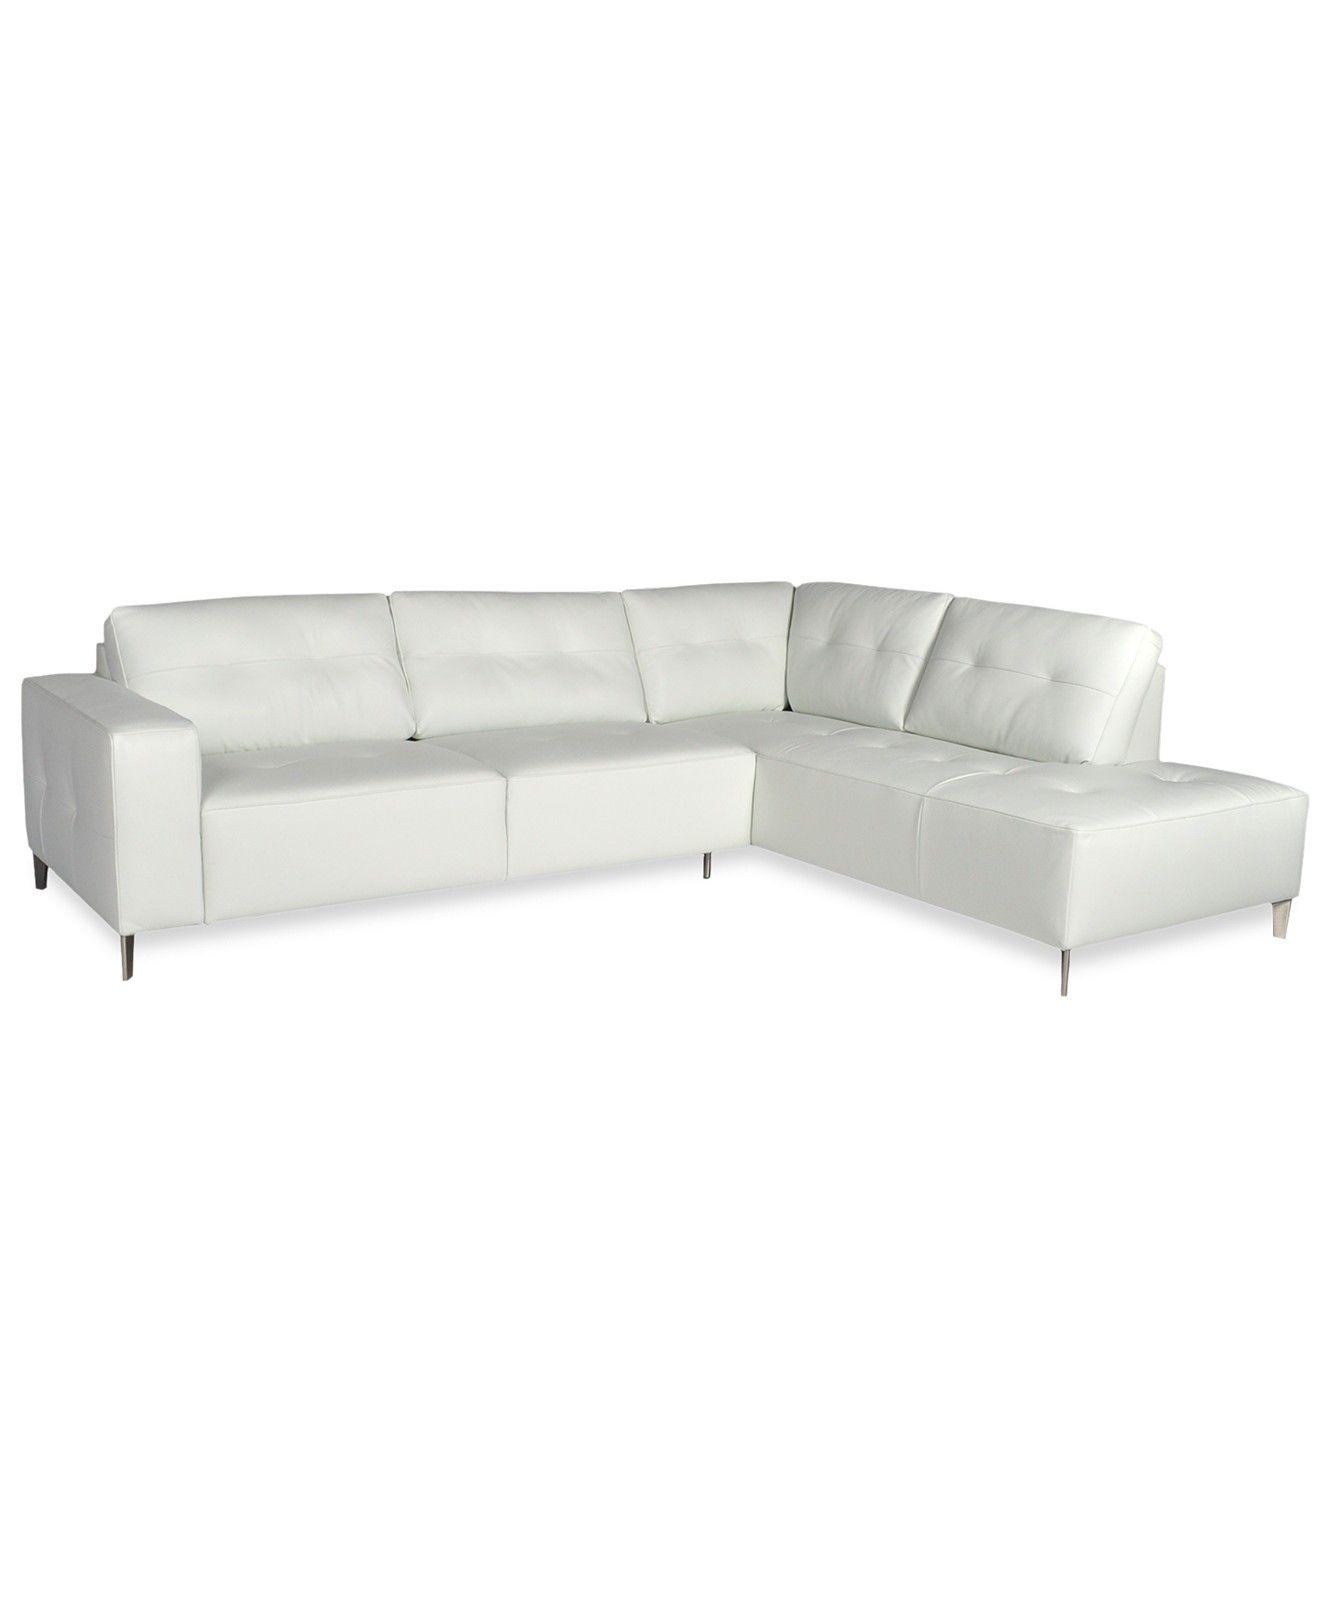 Giada Leather Sectional Sofa Furniture Macy S Leather Sectional Sofa Leather Sectional Furniture